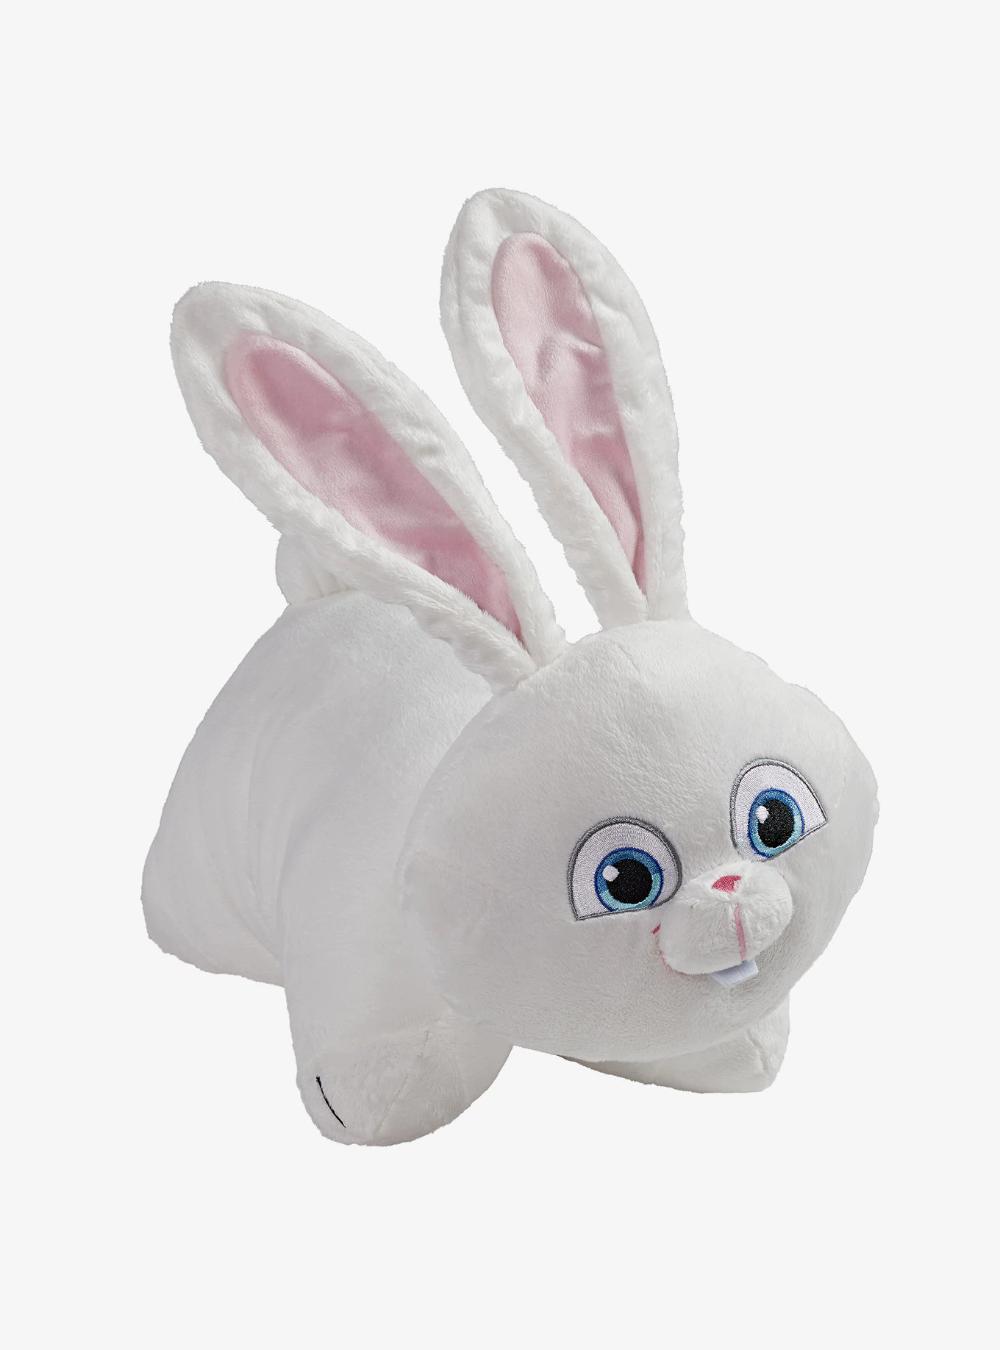 Pin On Stuffed Toys Plushies